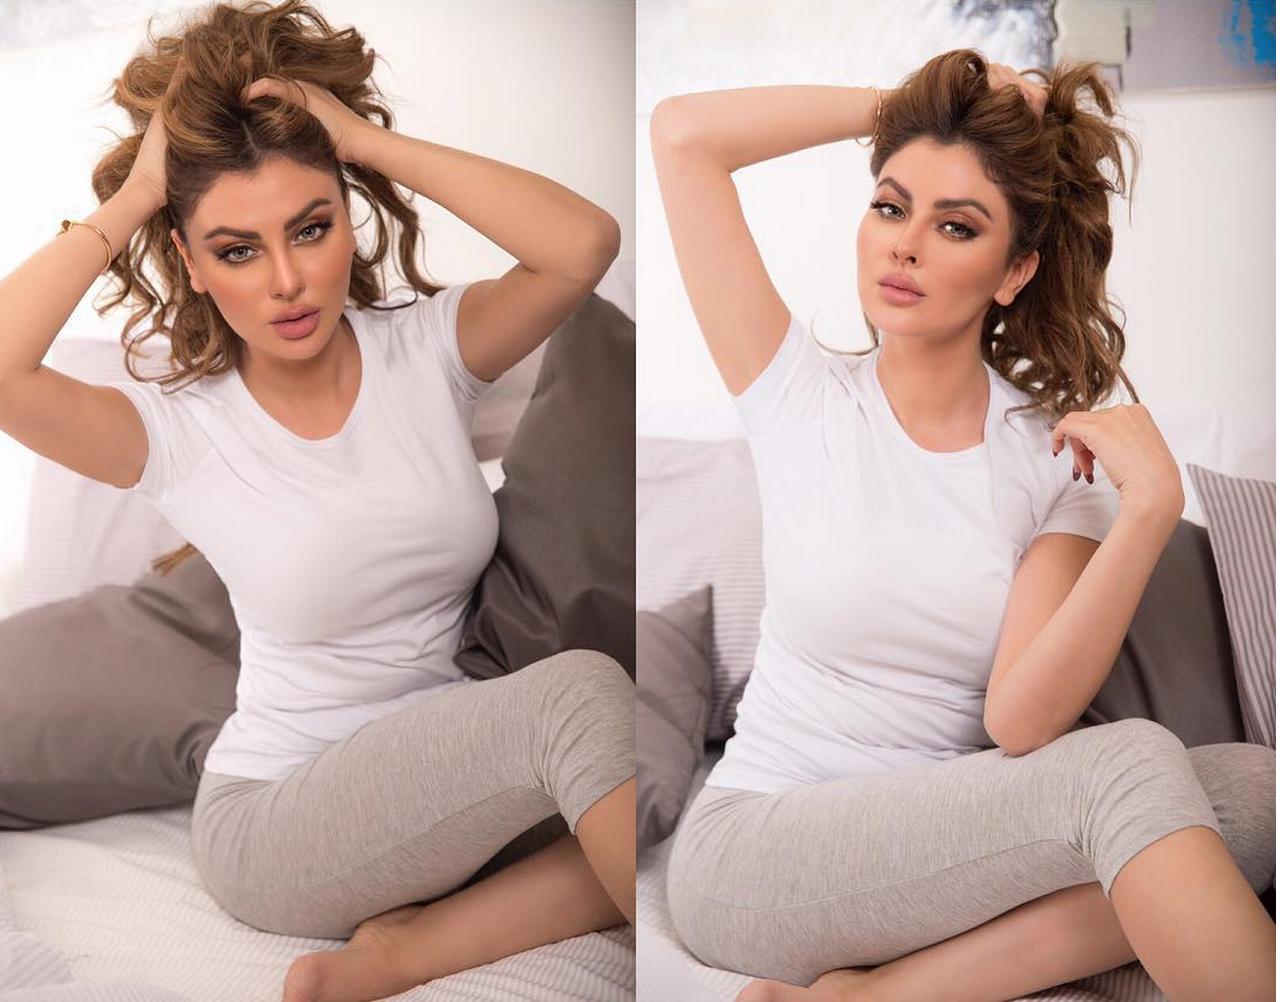 Em hussein lebanese sexy woman 4